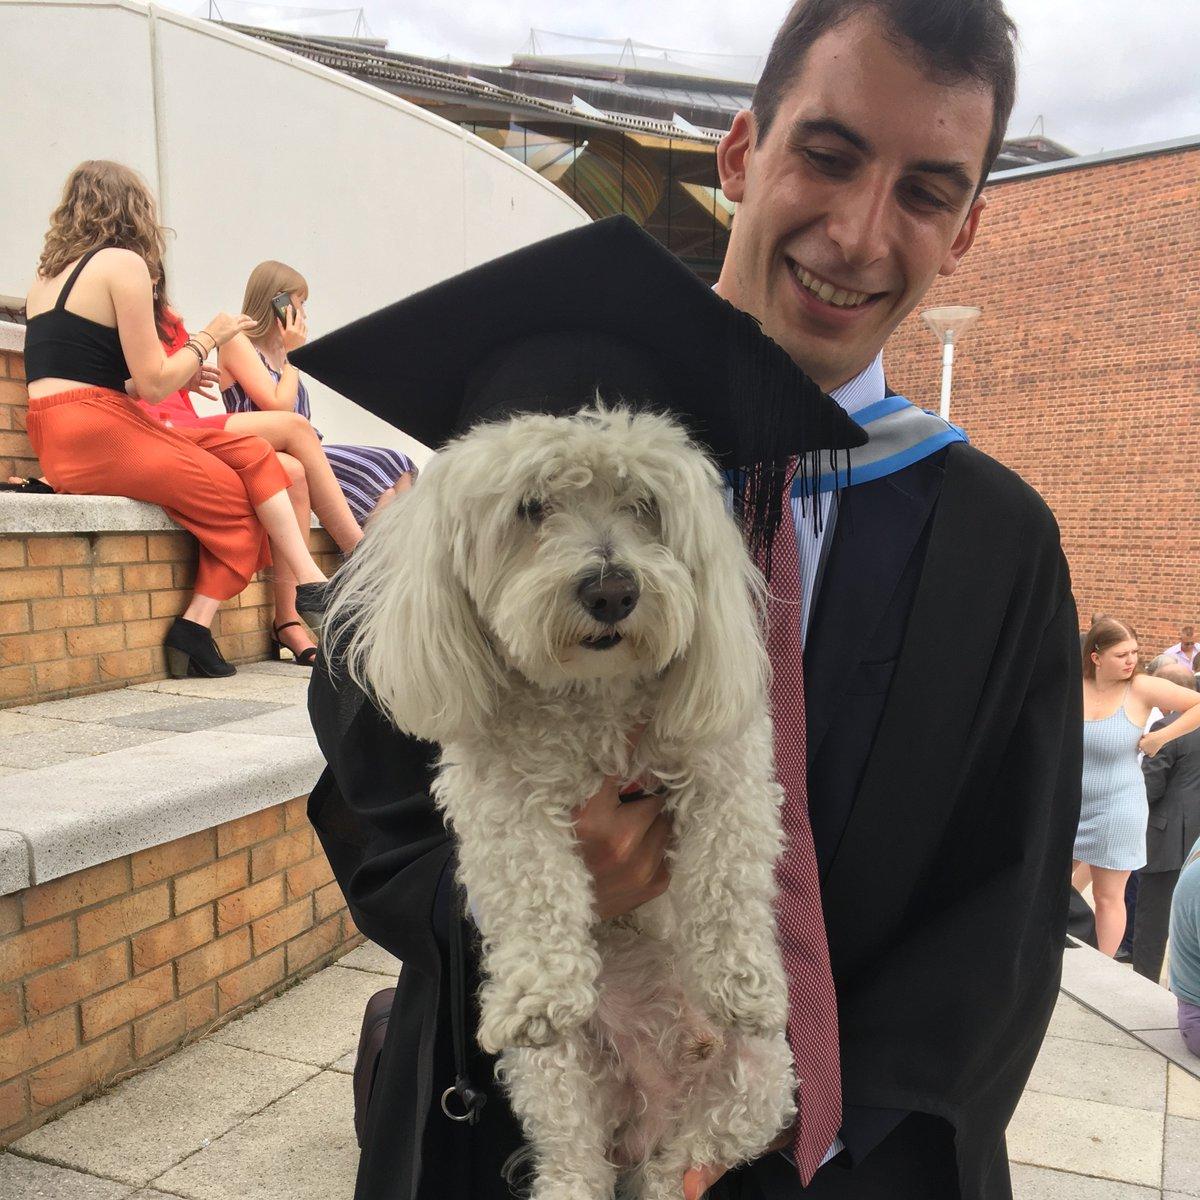 We found another proud doggo today #dogsatgraduation